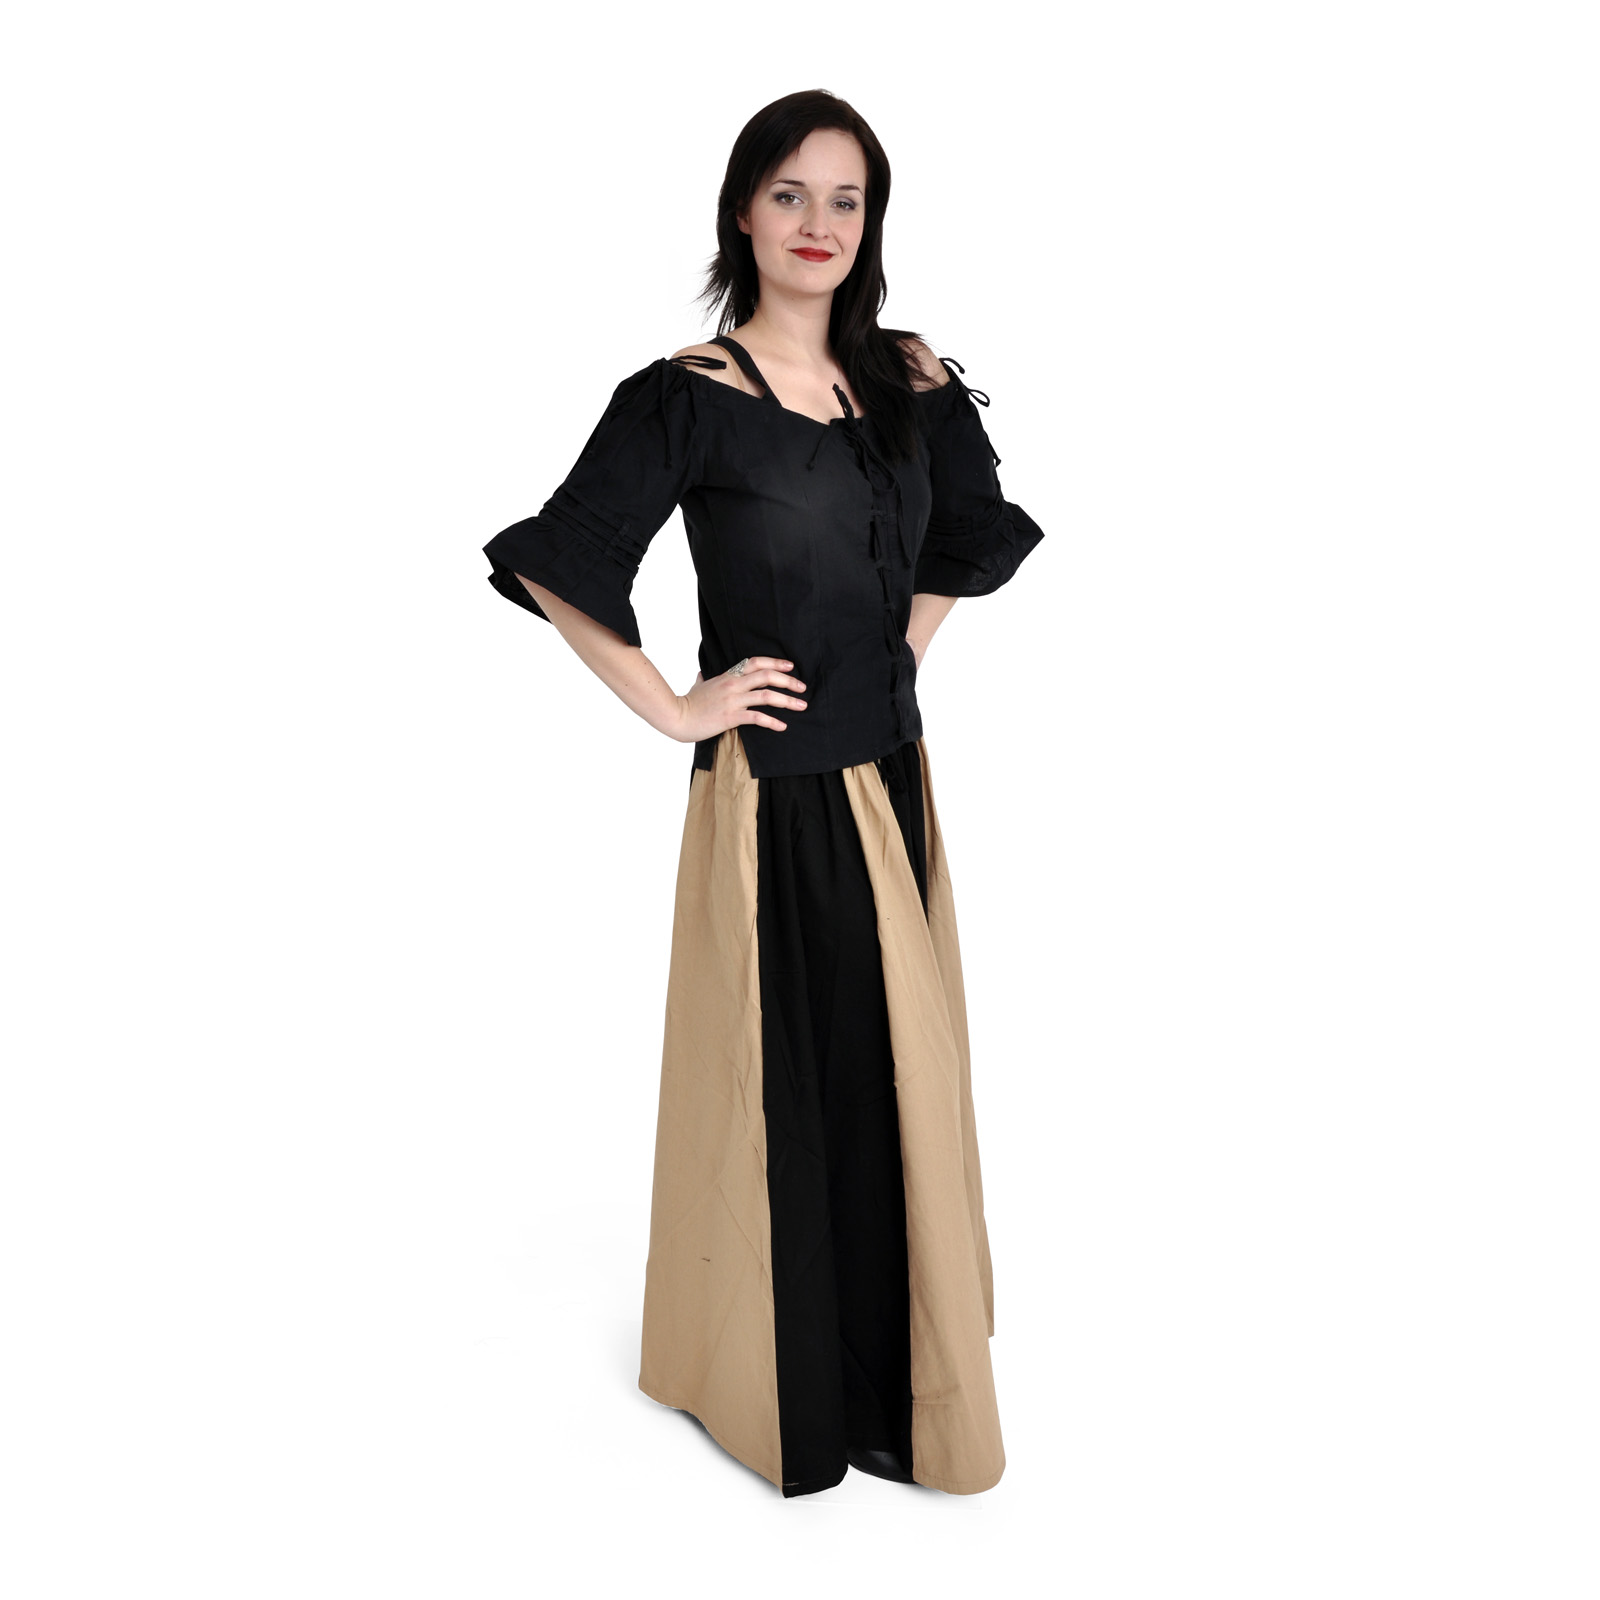 Linda - Bluse schwarz